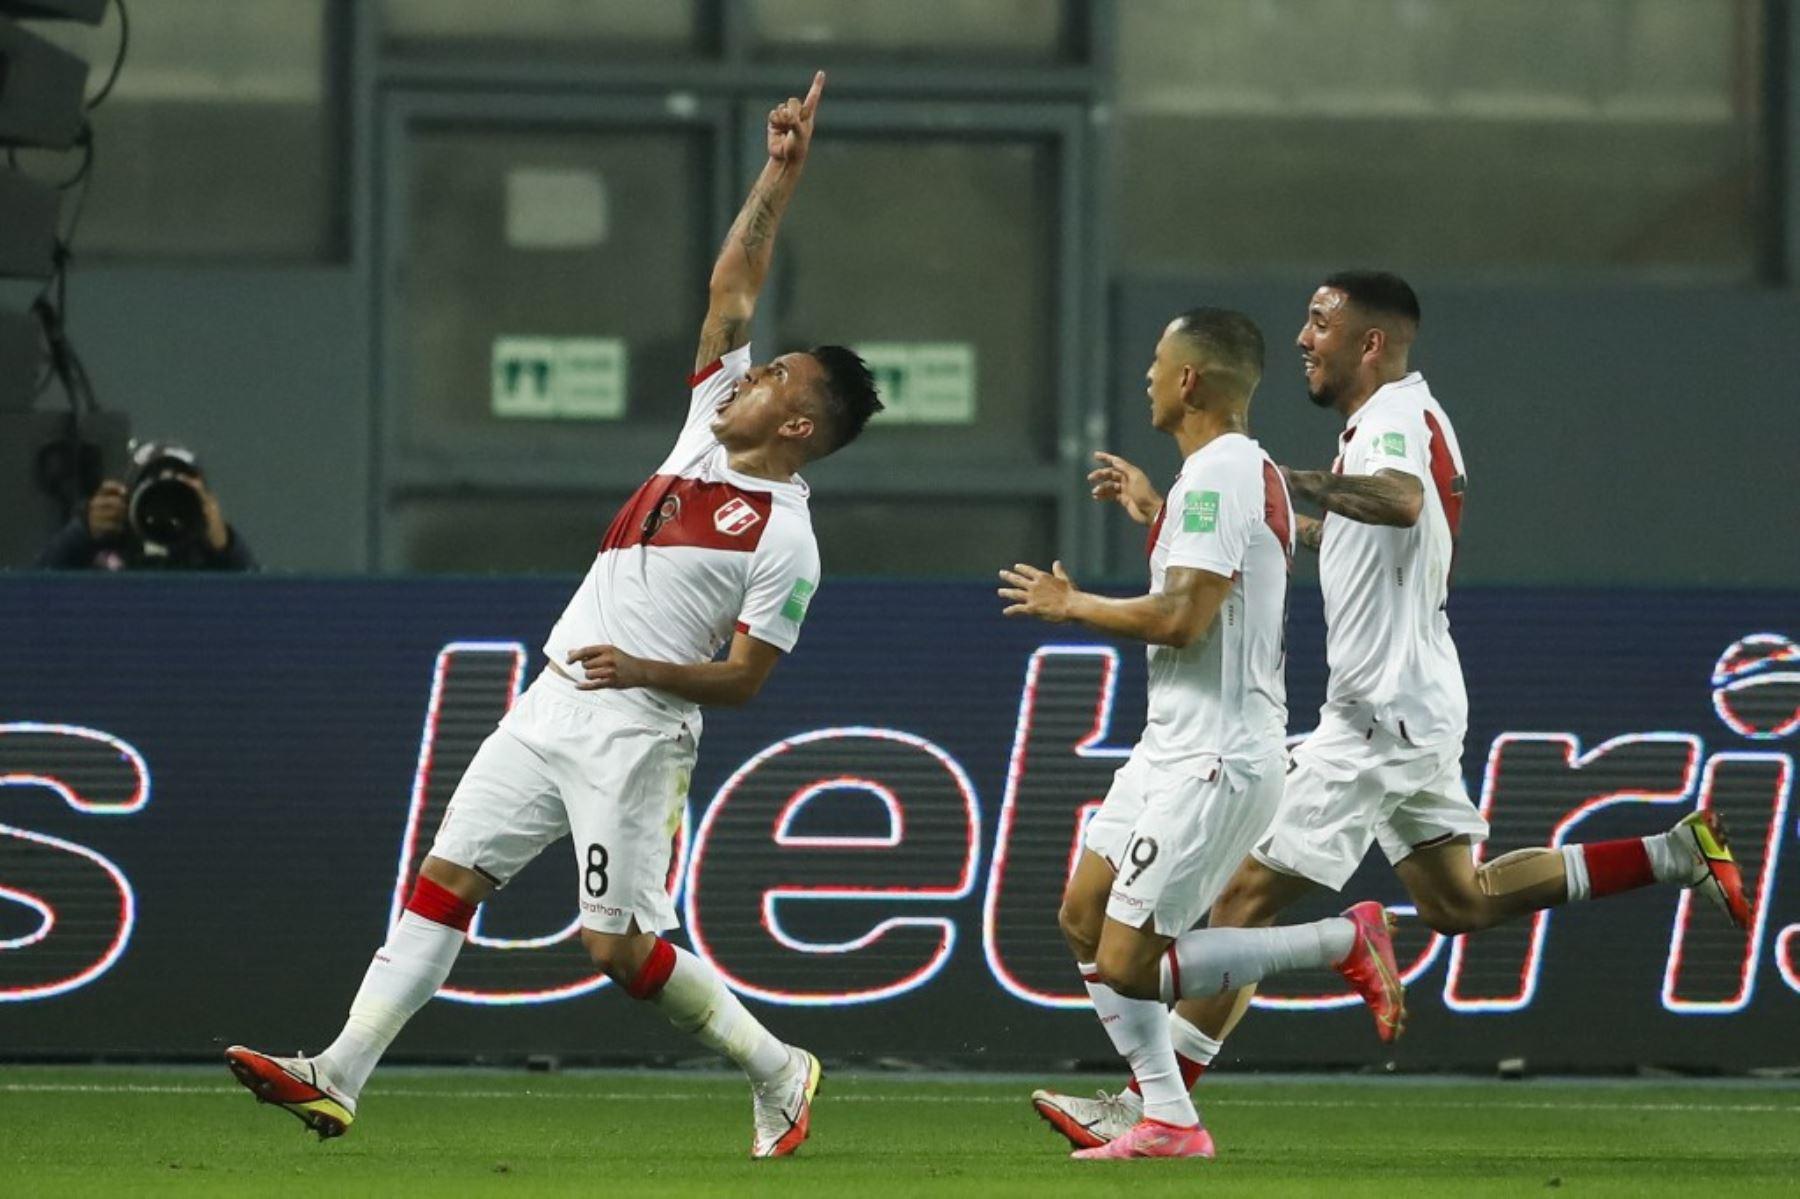 Perú gana a Chile por 1 a 0 con un golazo de Christian Cueva al final del primer tiempo